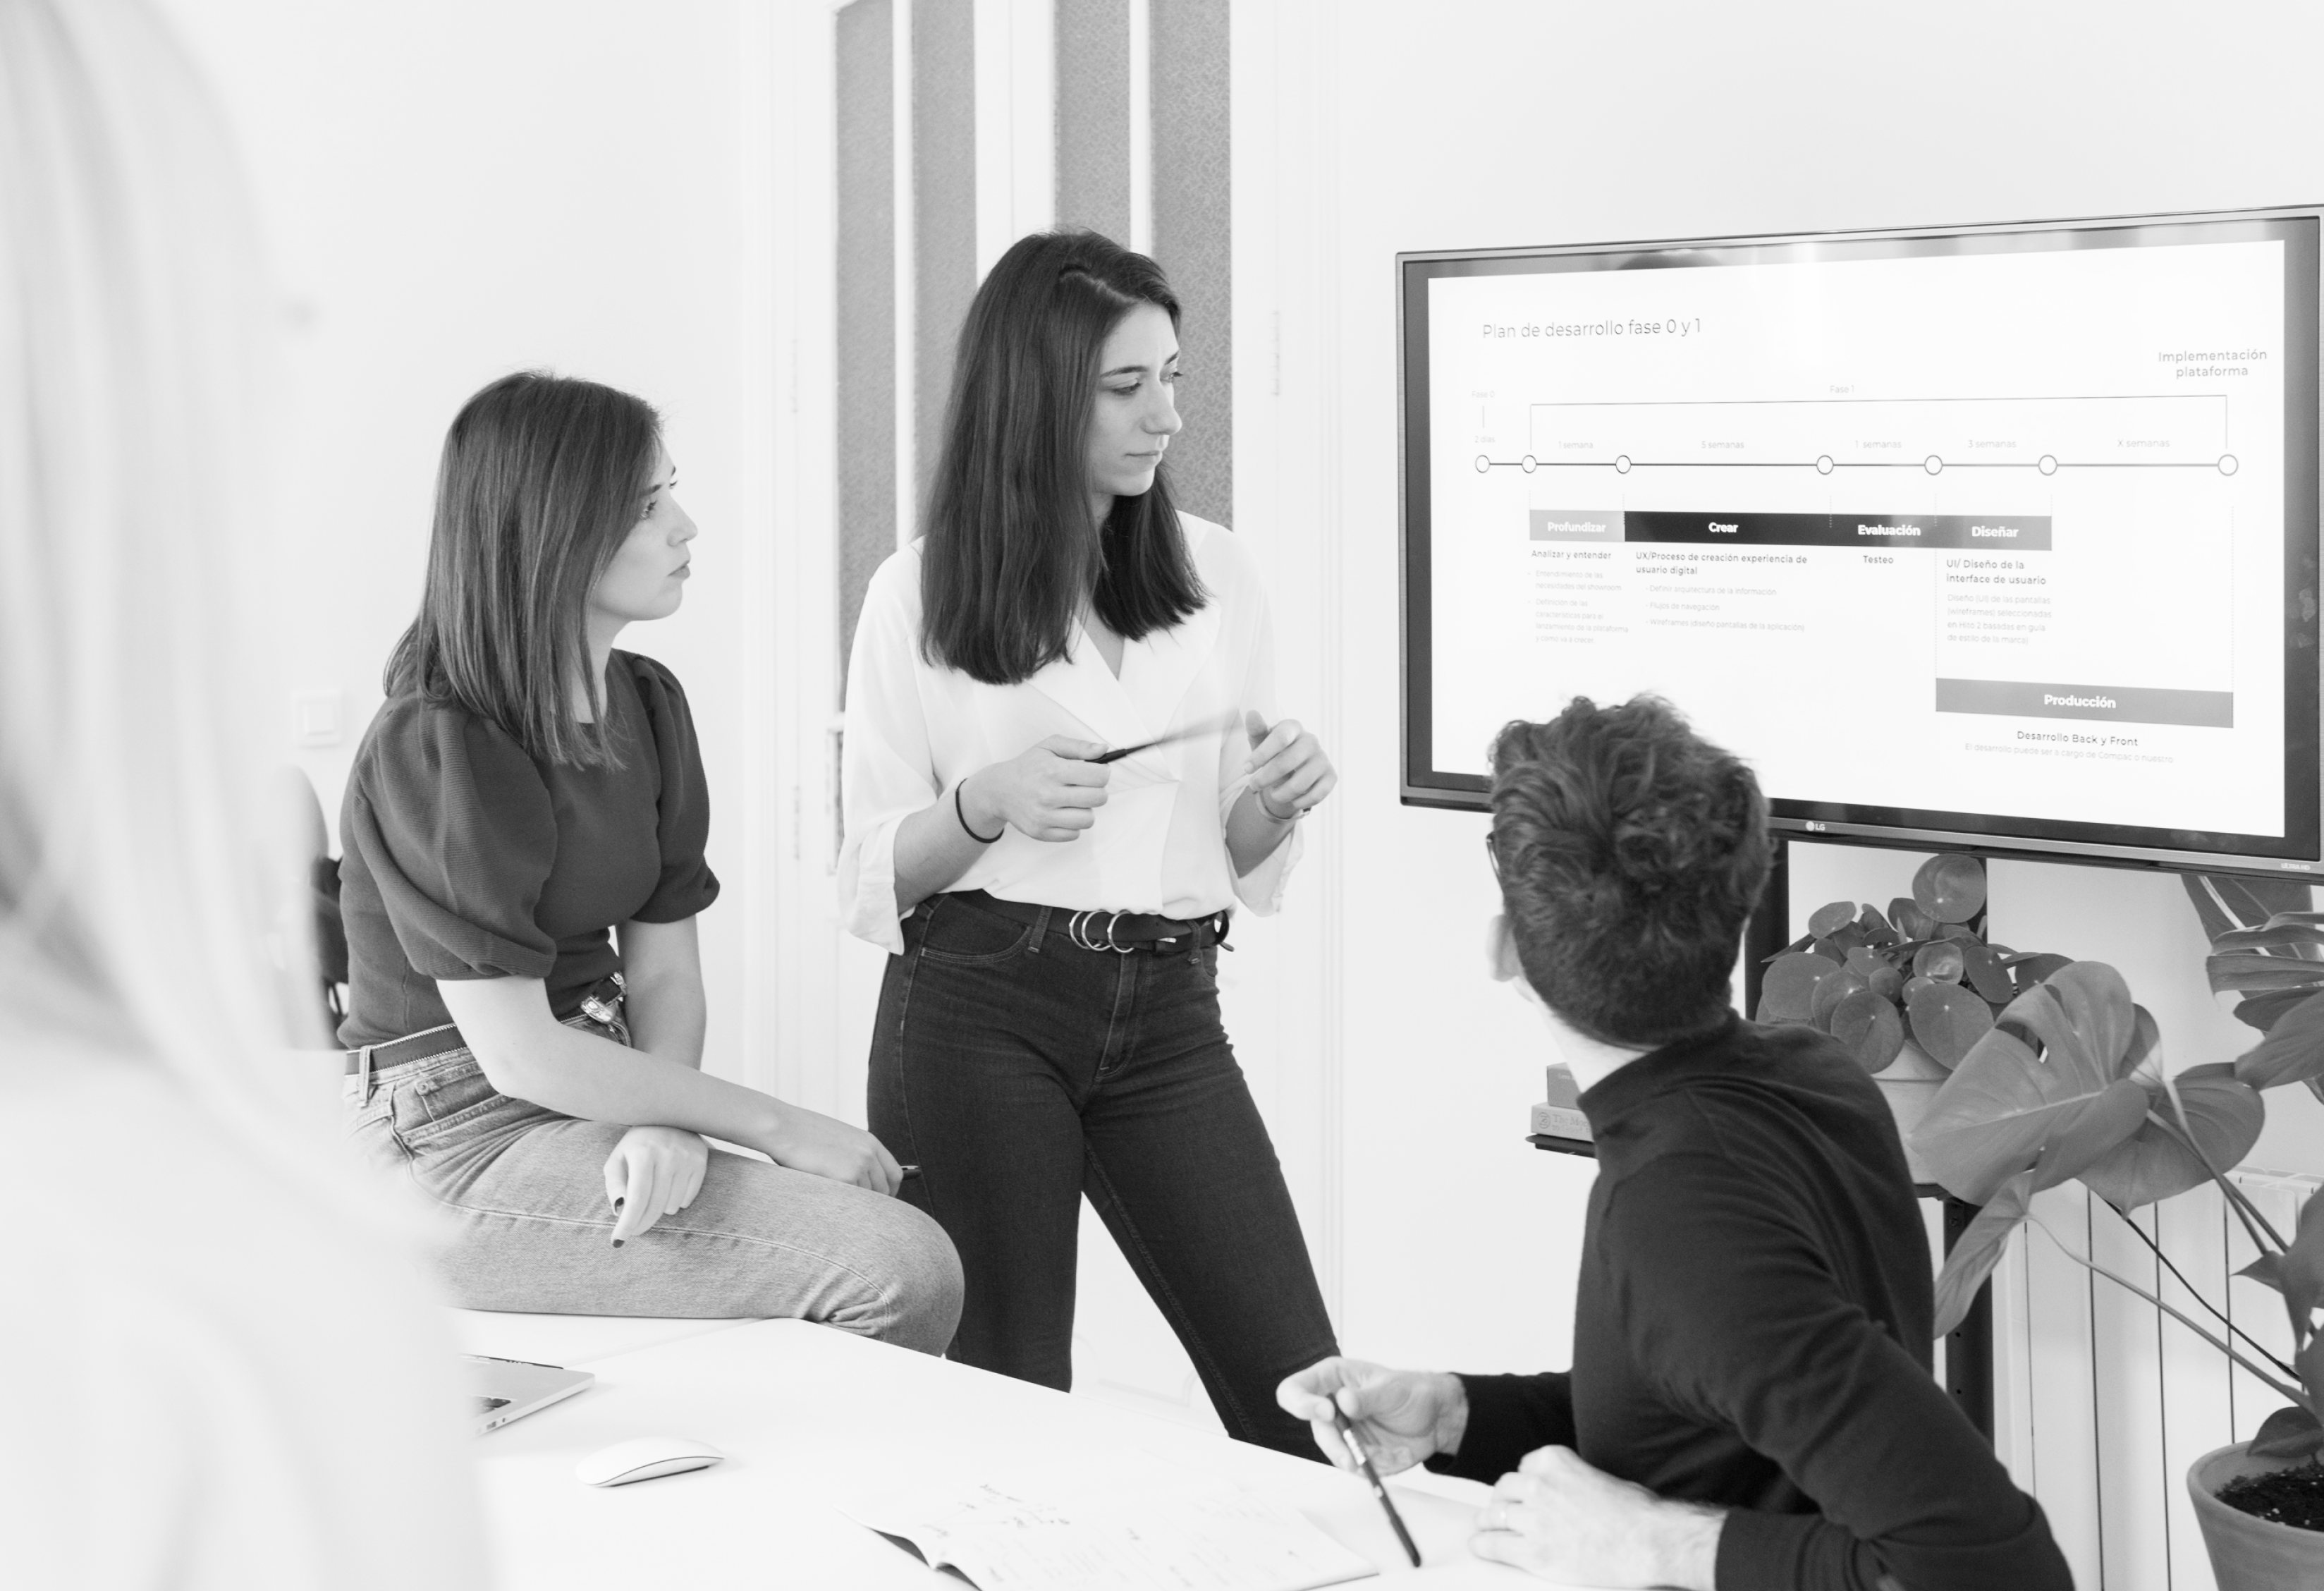 A multi-disciplinary team of designers, innovators, strategists and entrepreneurs.